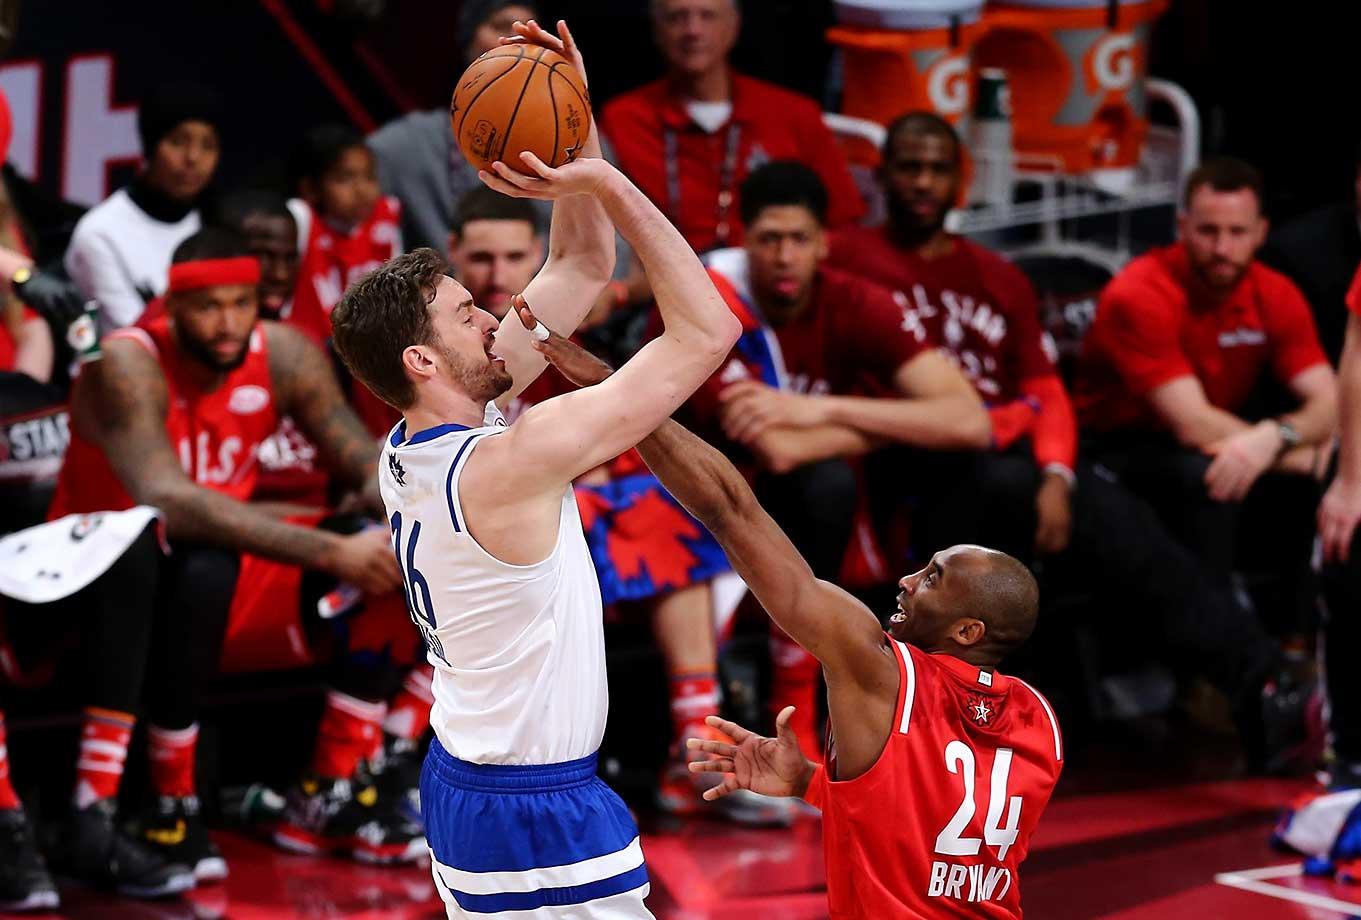 Pau Gasol shoots against his former teammate, Kobe Bryant.